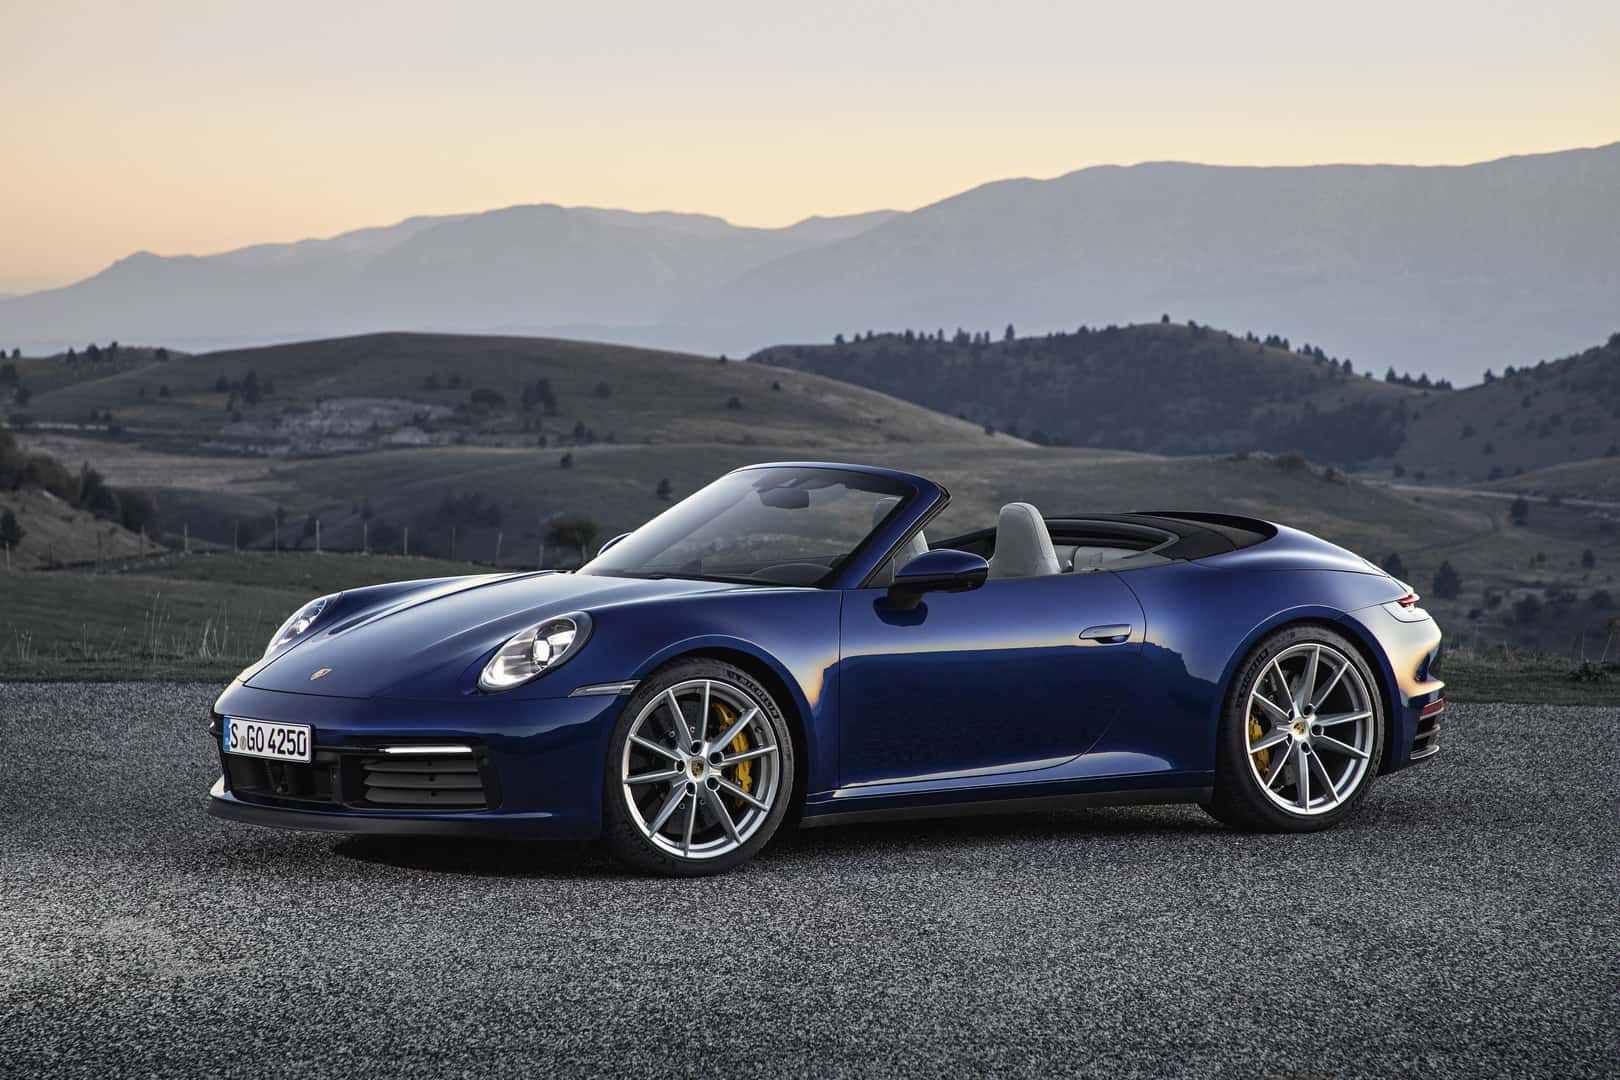 Porsche-911-Cabriolet-7